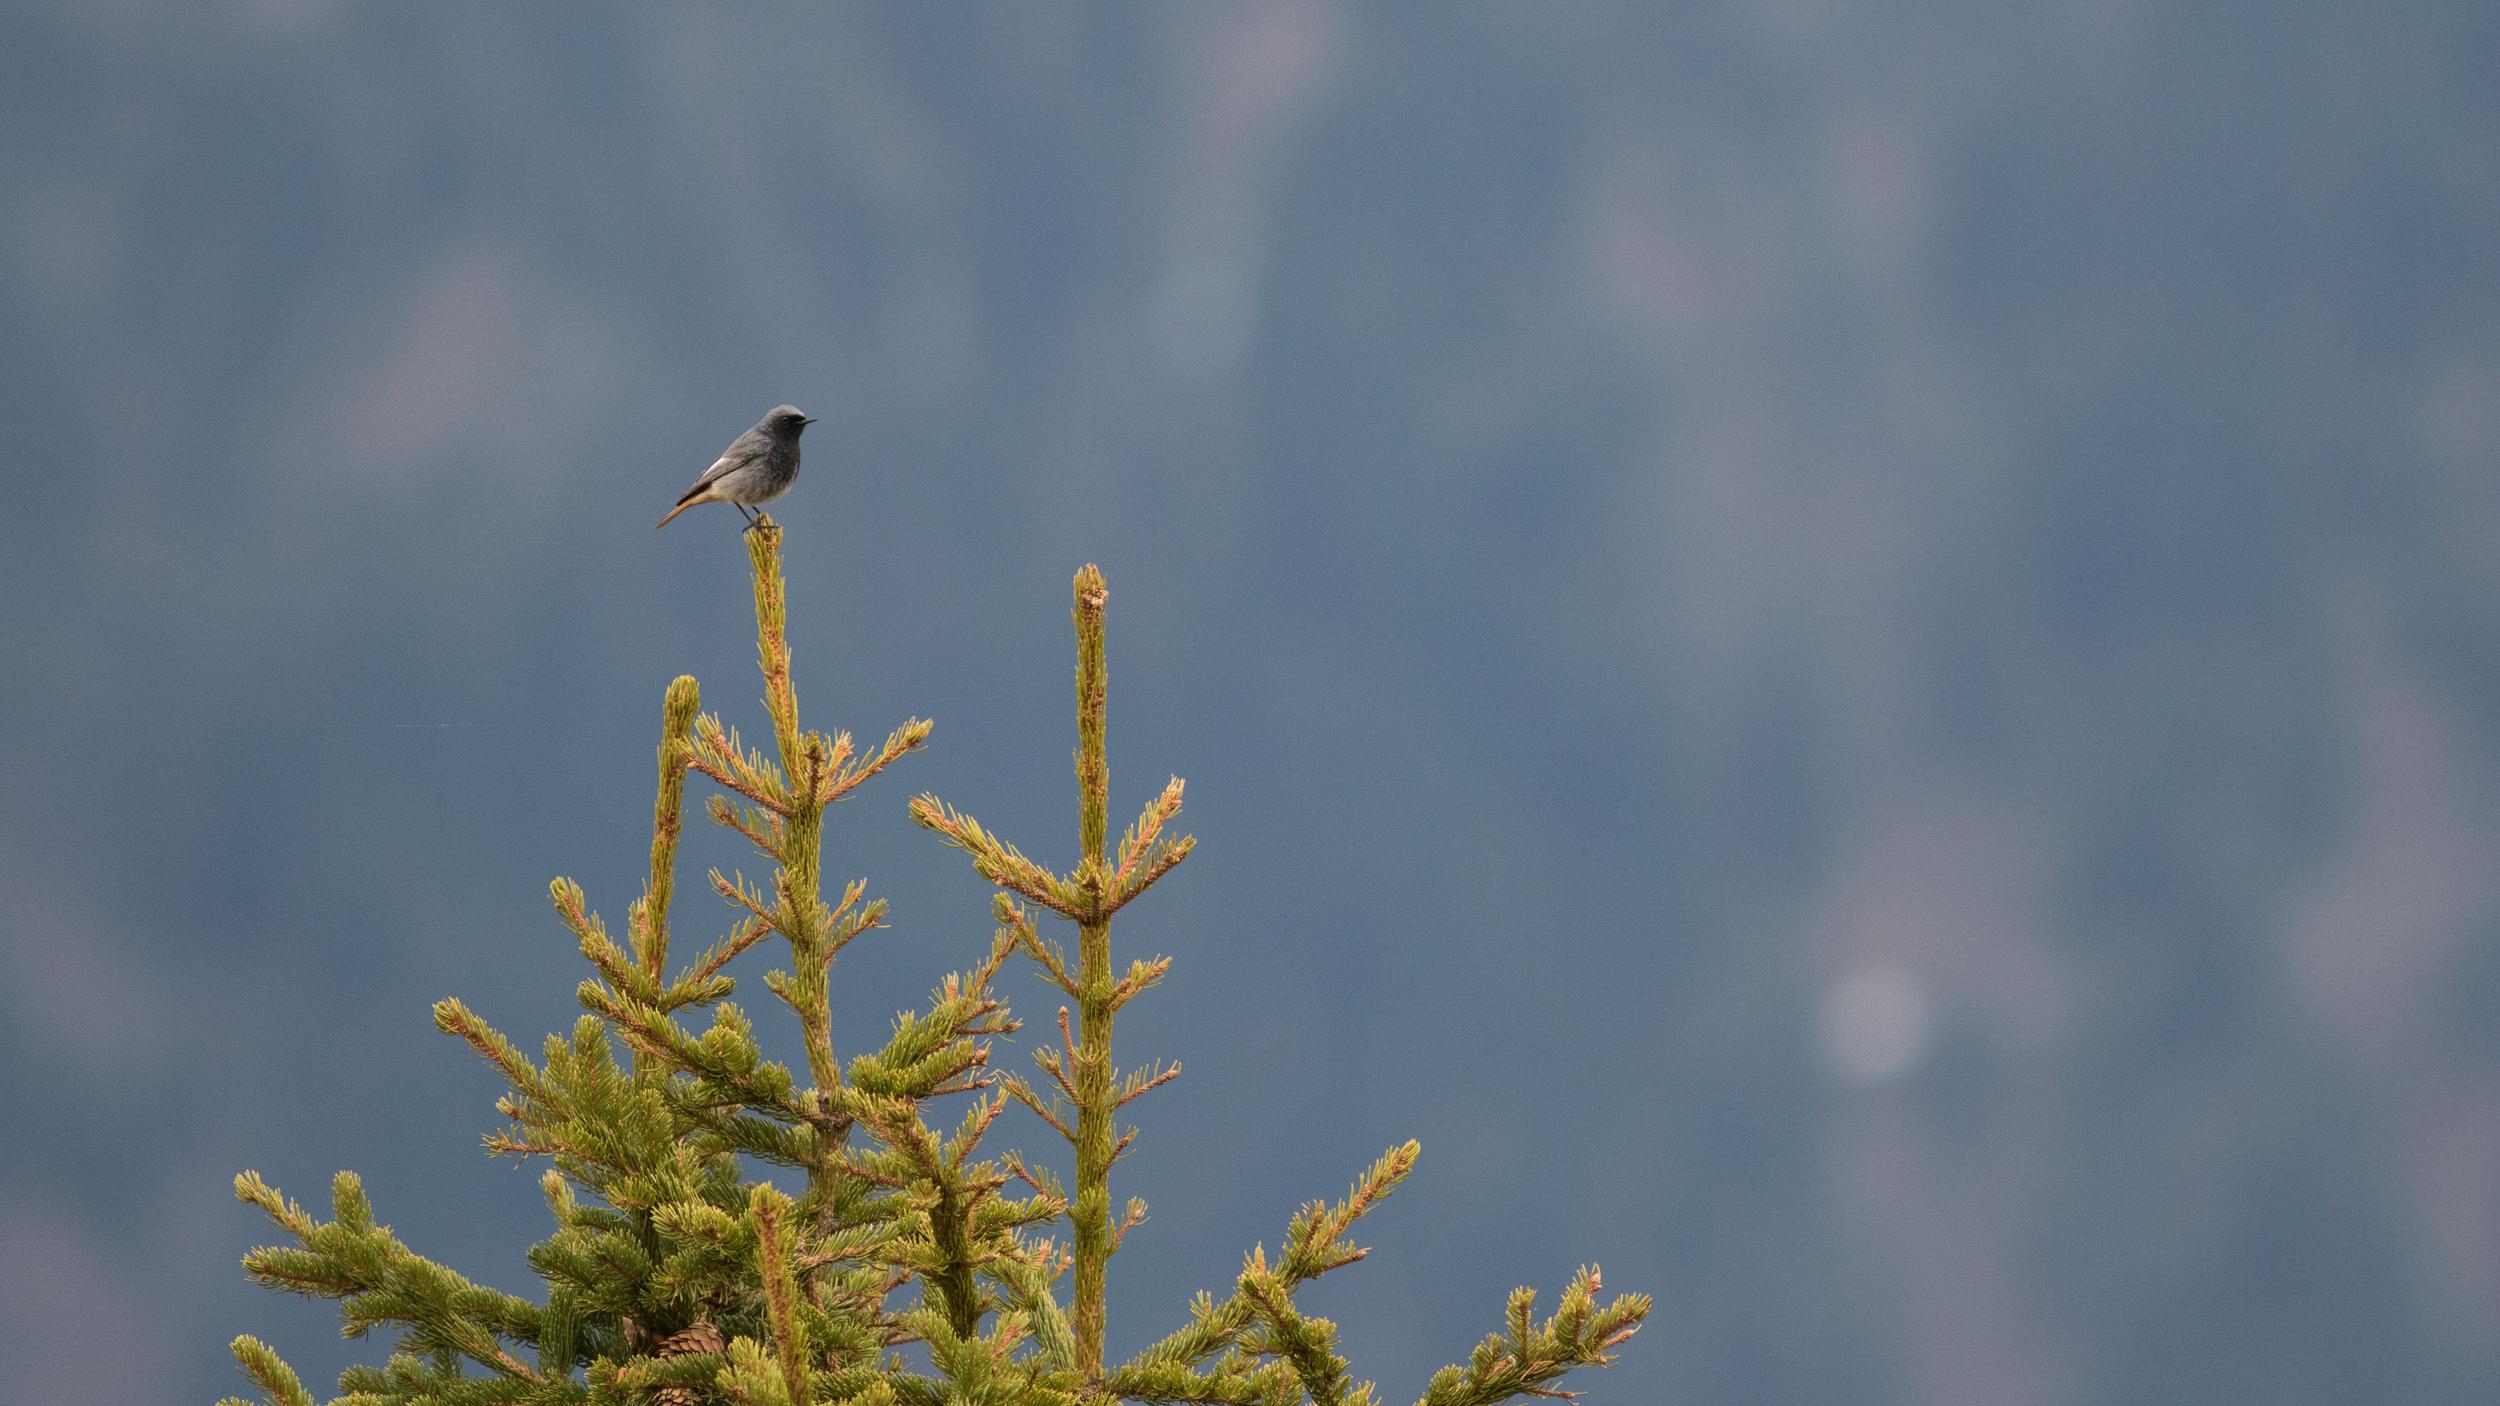 Male Black Redstart (Phoenicurus ochruros).